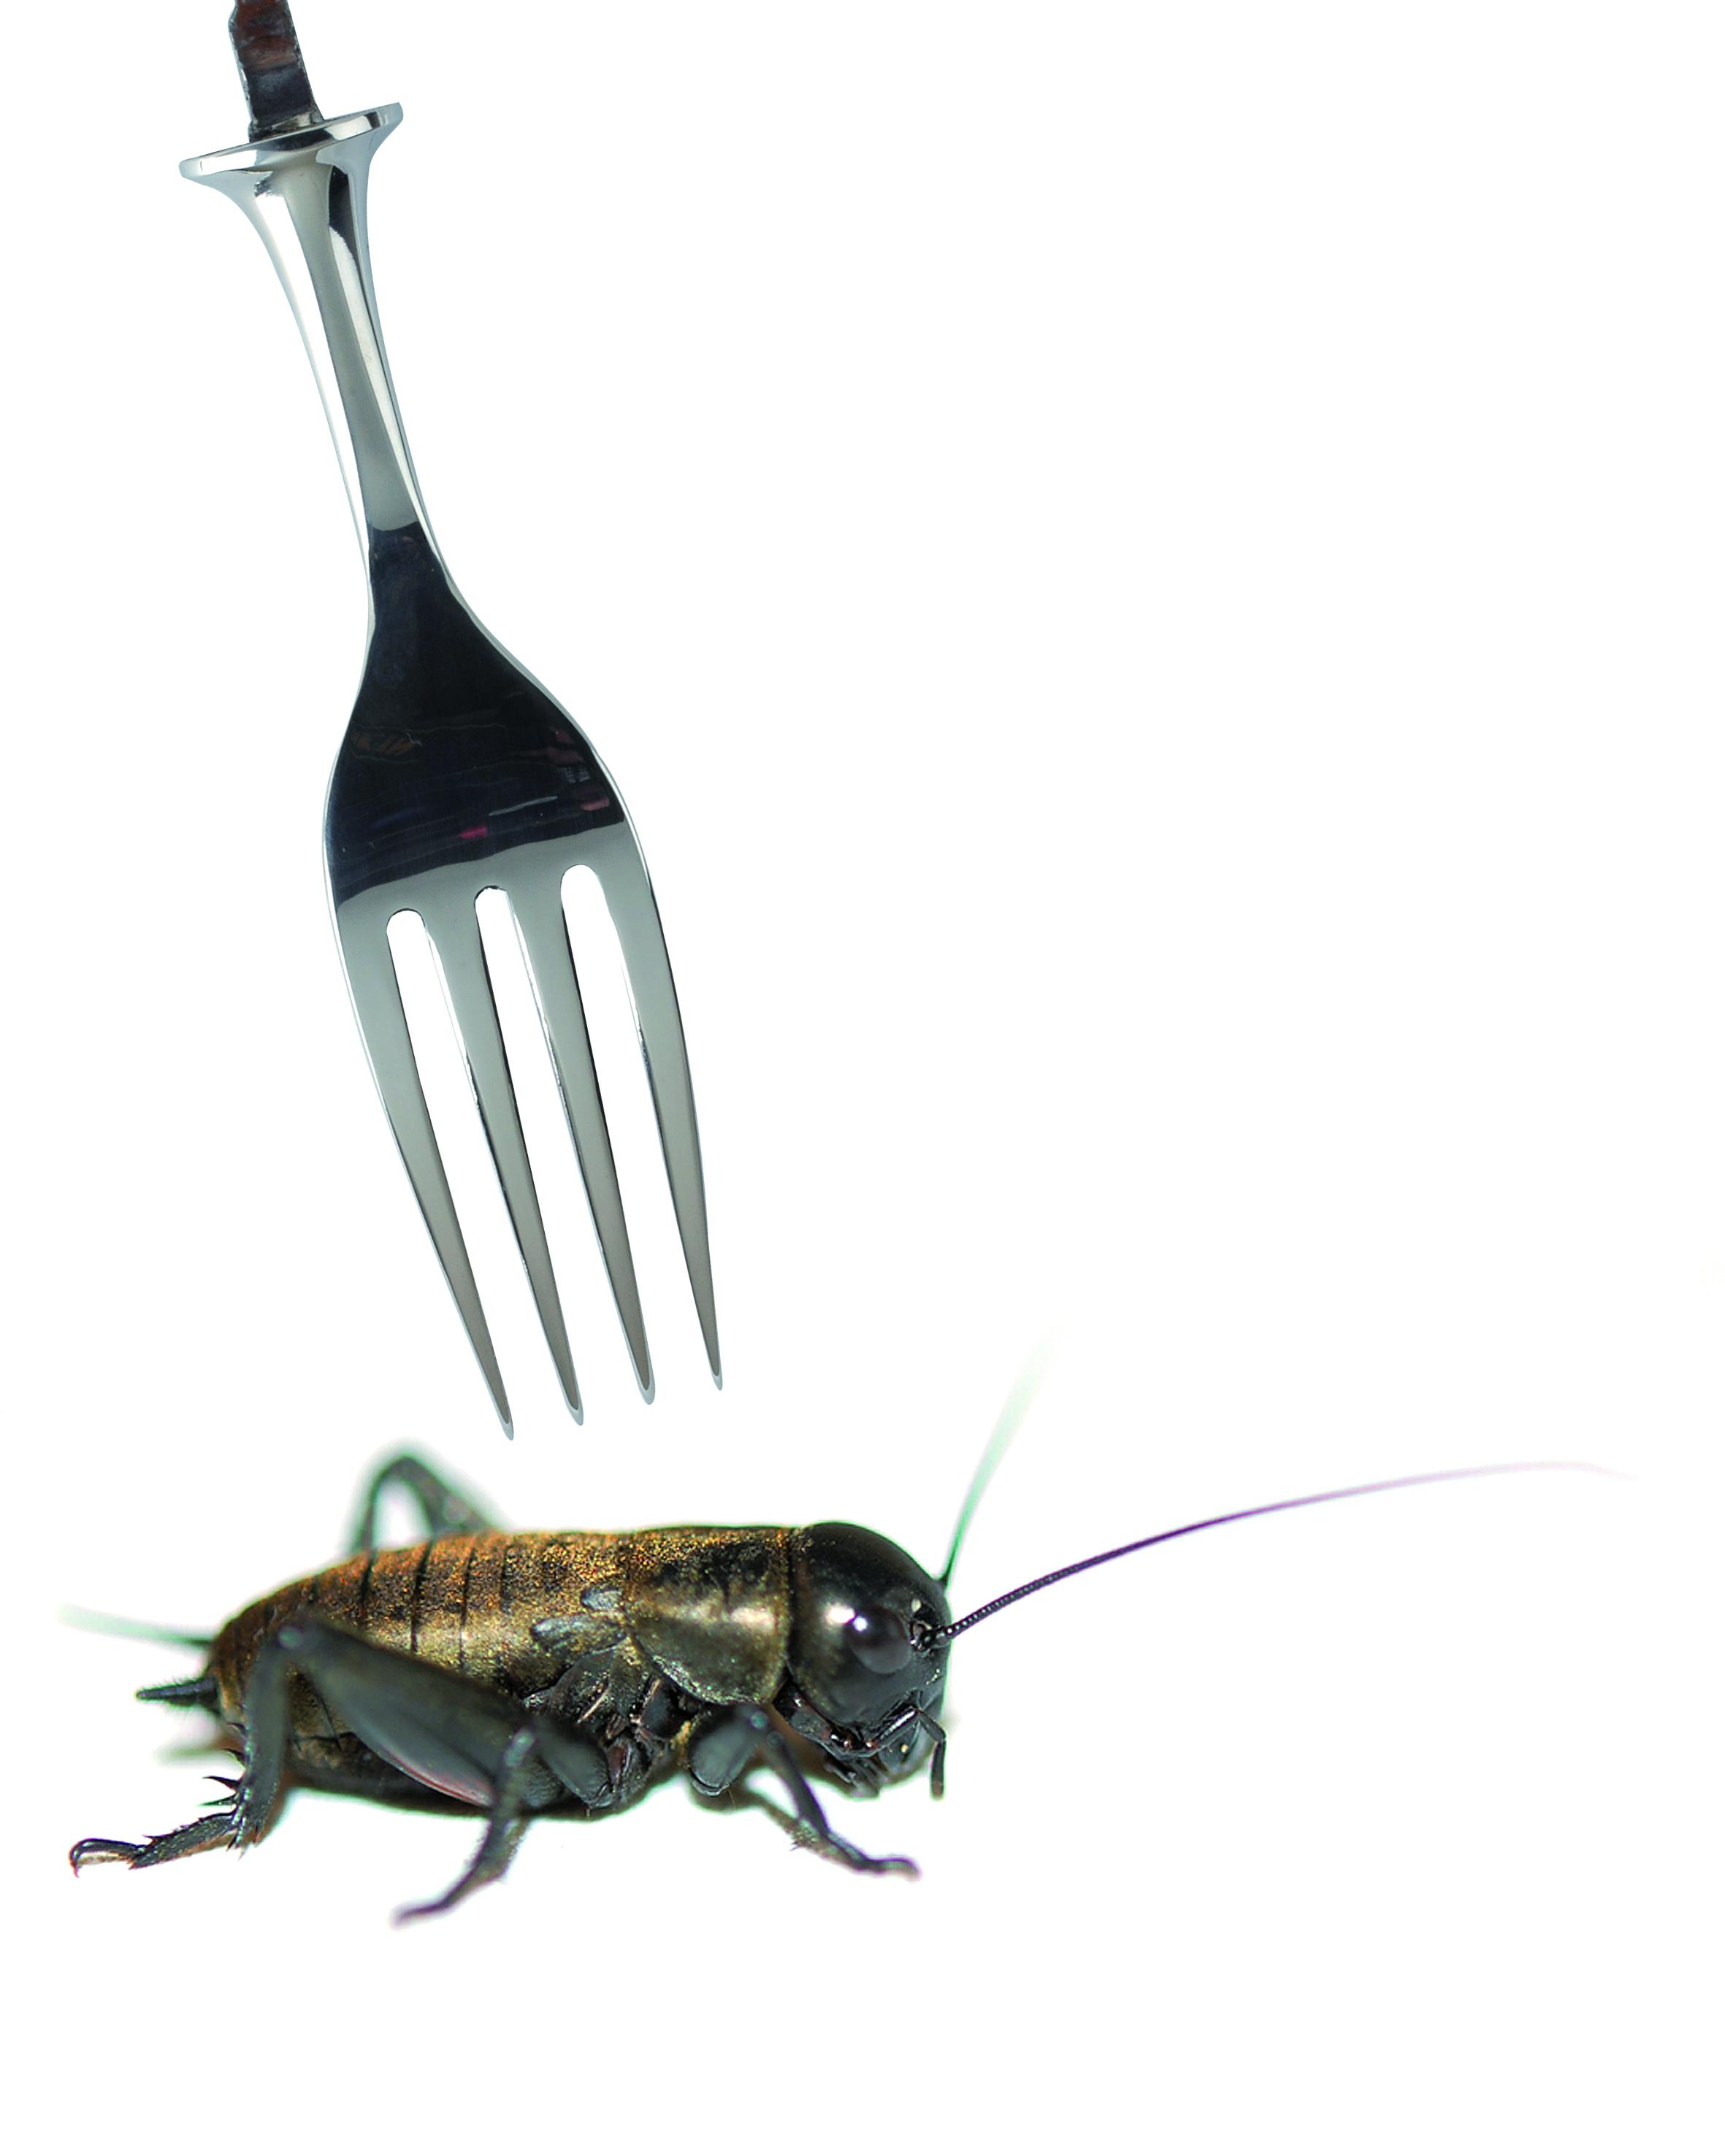 Élevage d'insectes : l'eldorado du futur ?